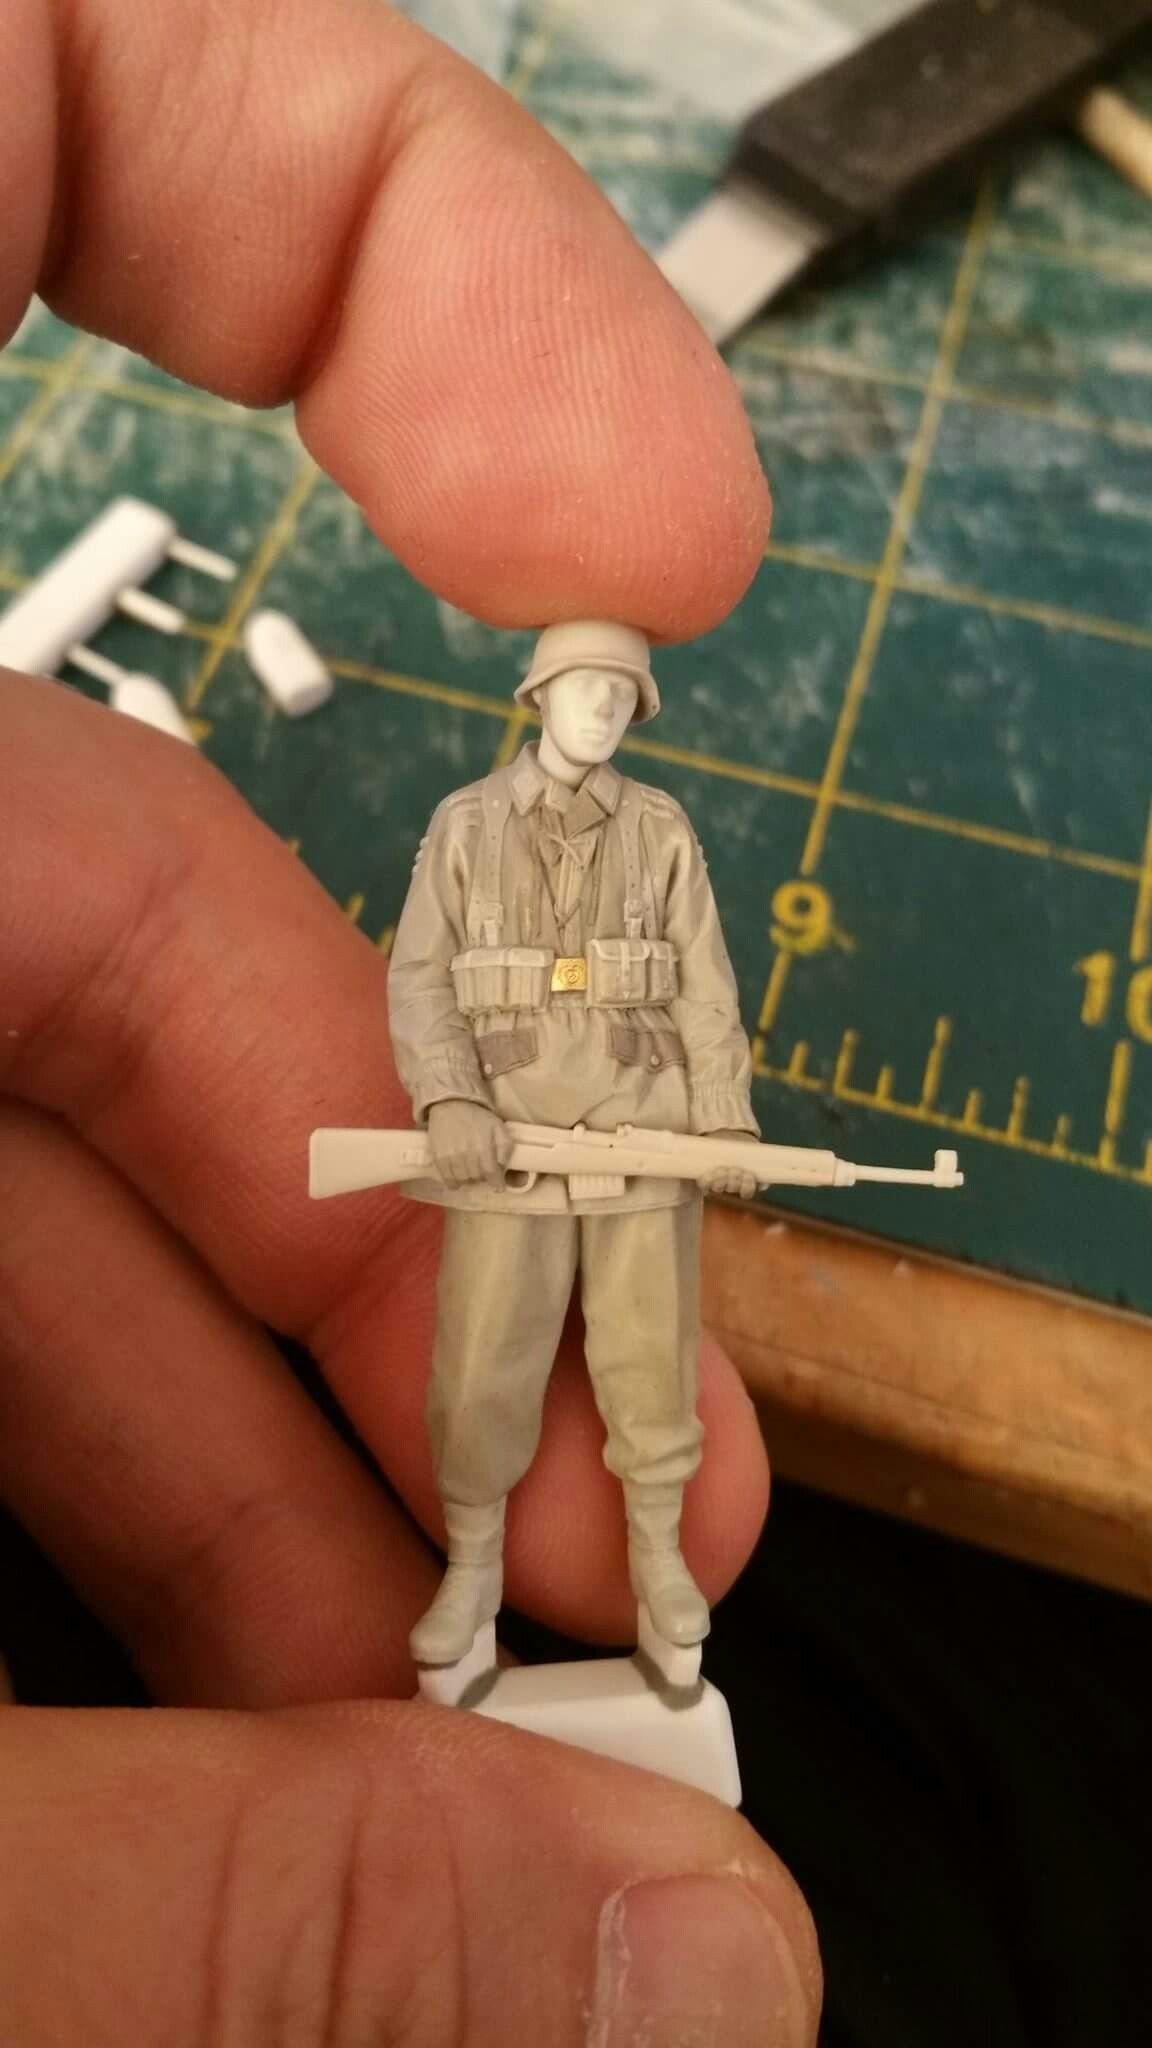 Pin de Masjuan en figuras militares | Pinterest | Militar